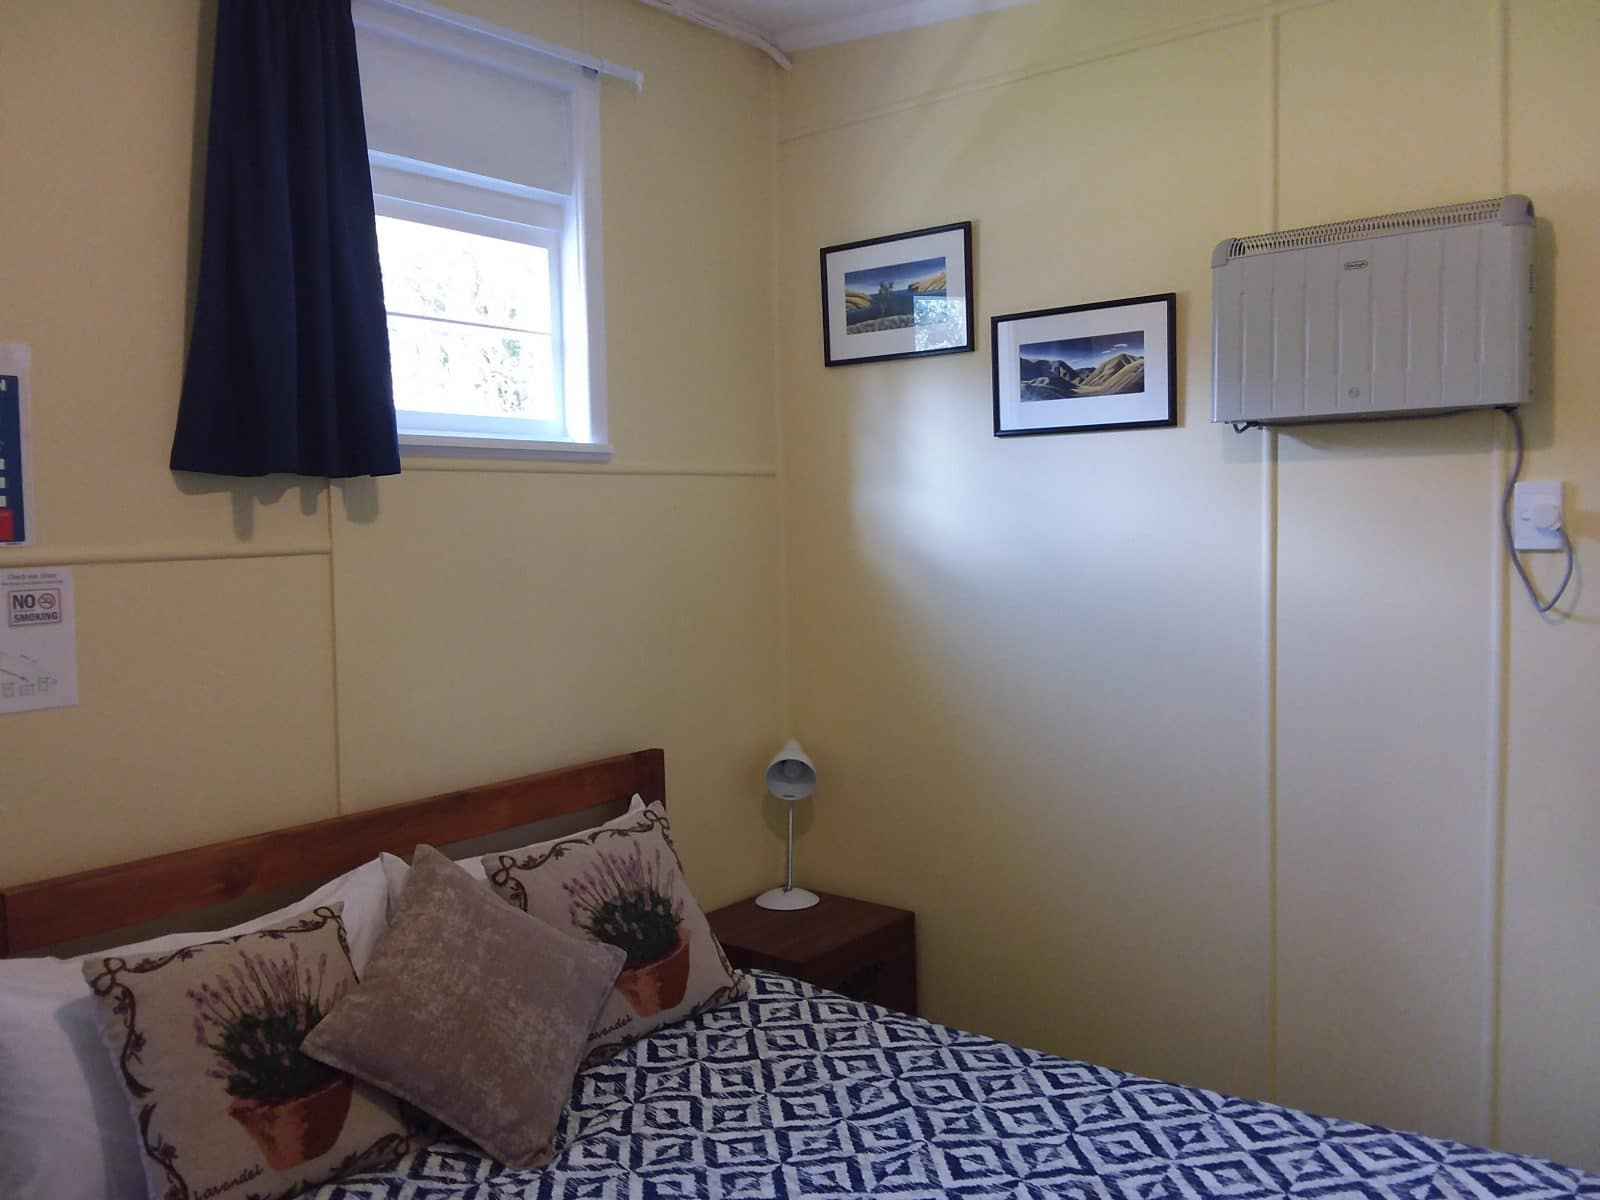 Cabin 3 pic 2